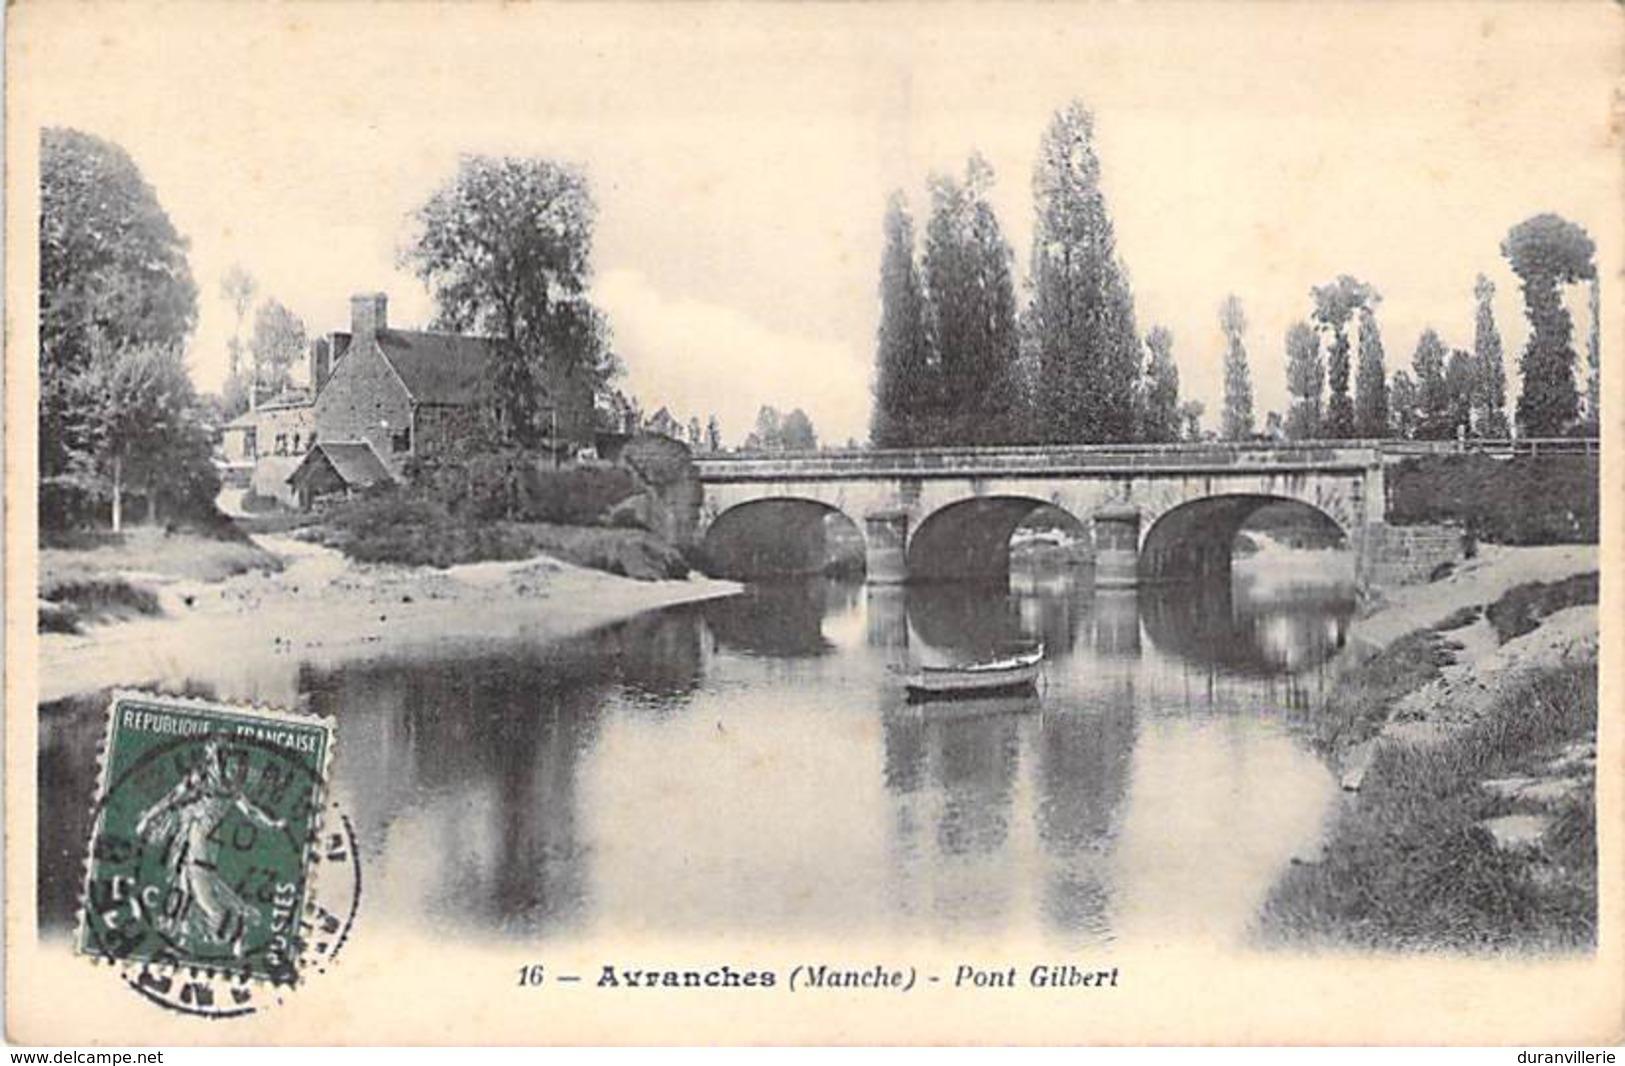 50 - AVRANCHES - Pont Gilbert. 1907 - Avranches